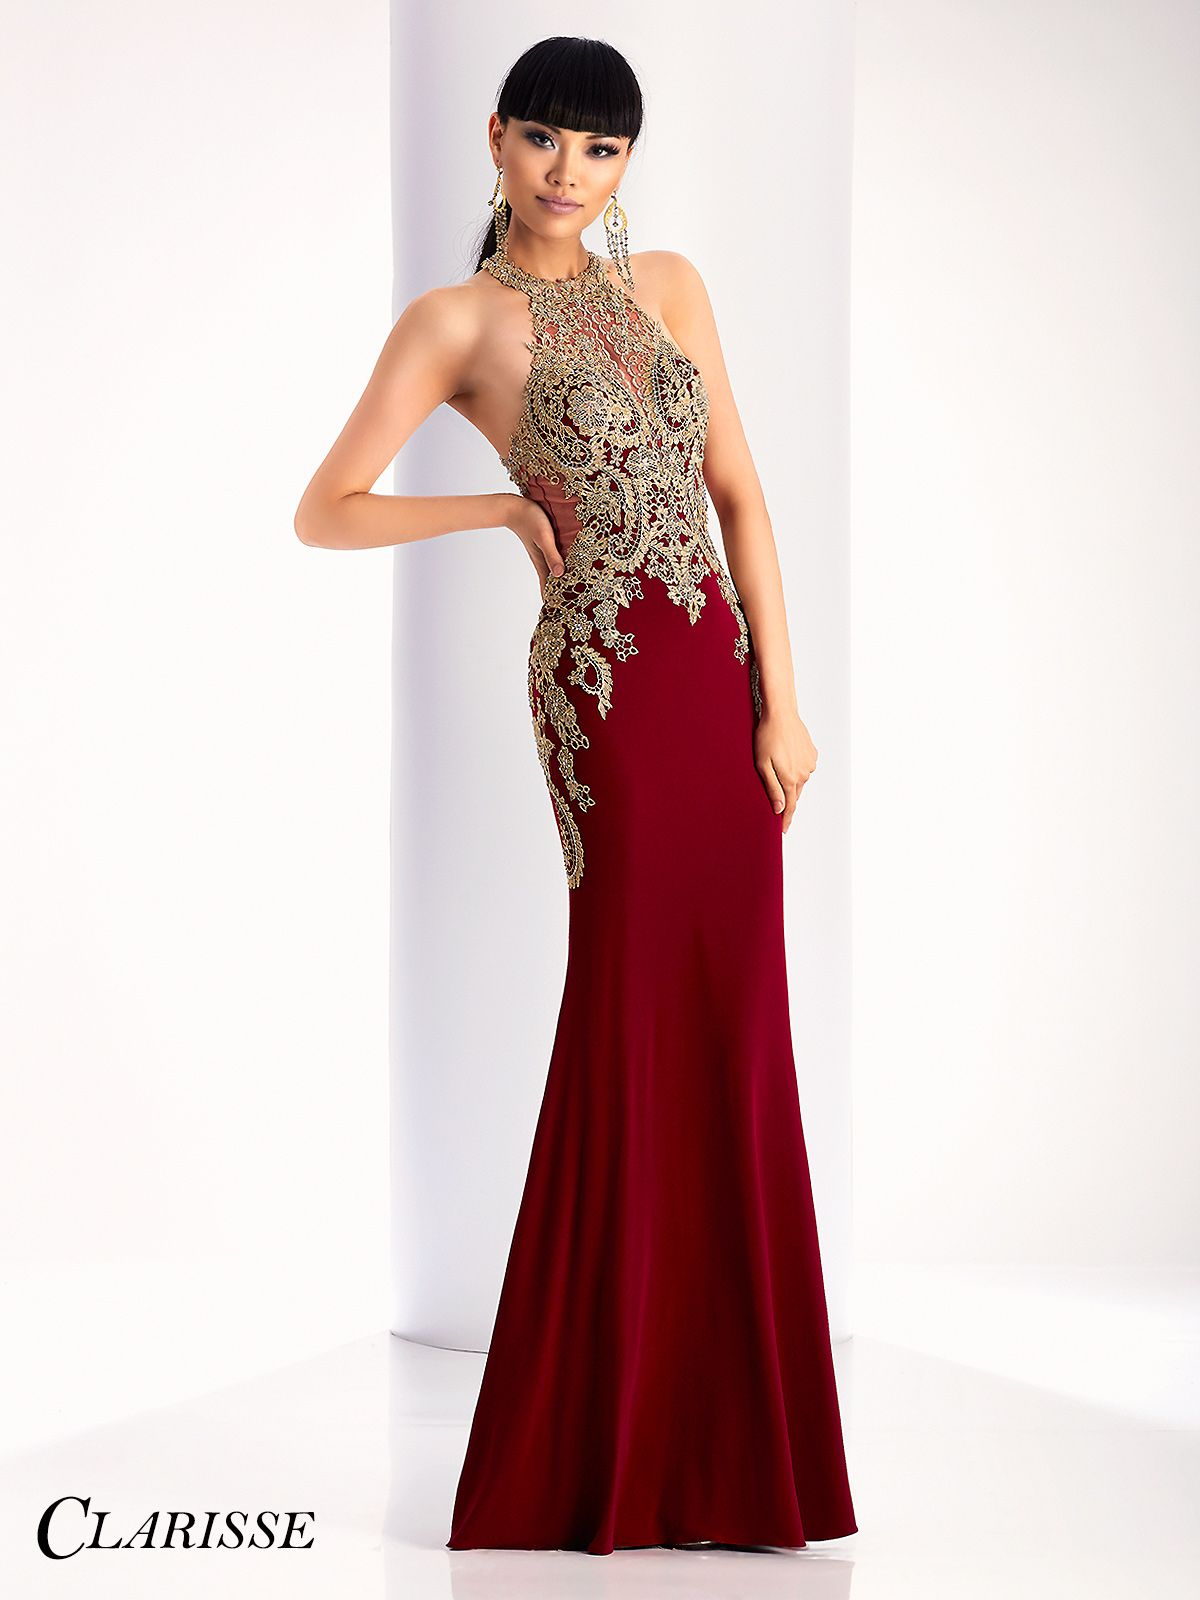 Clarisse Gold Lace Embellished Prom Dress 4819 - Clarisse Gold Lace Embellished Prom Dress 4819. Beautiful And